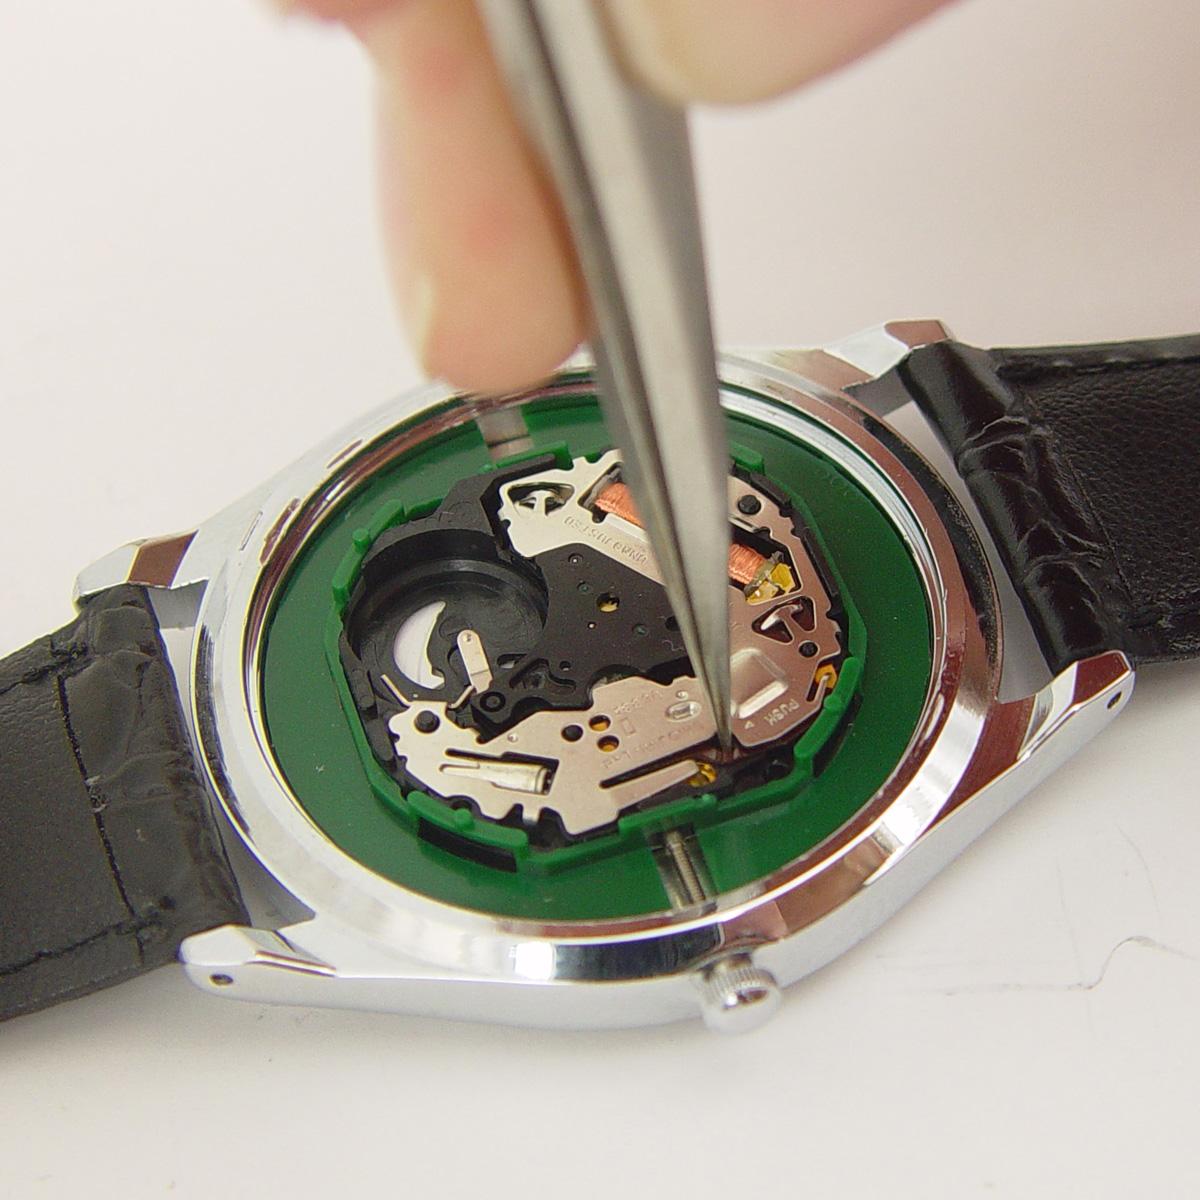 a33a03f23 Removing Watch Stem | Watch Stem Removal Tips | Esslinger.com ...